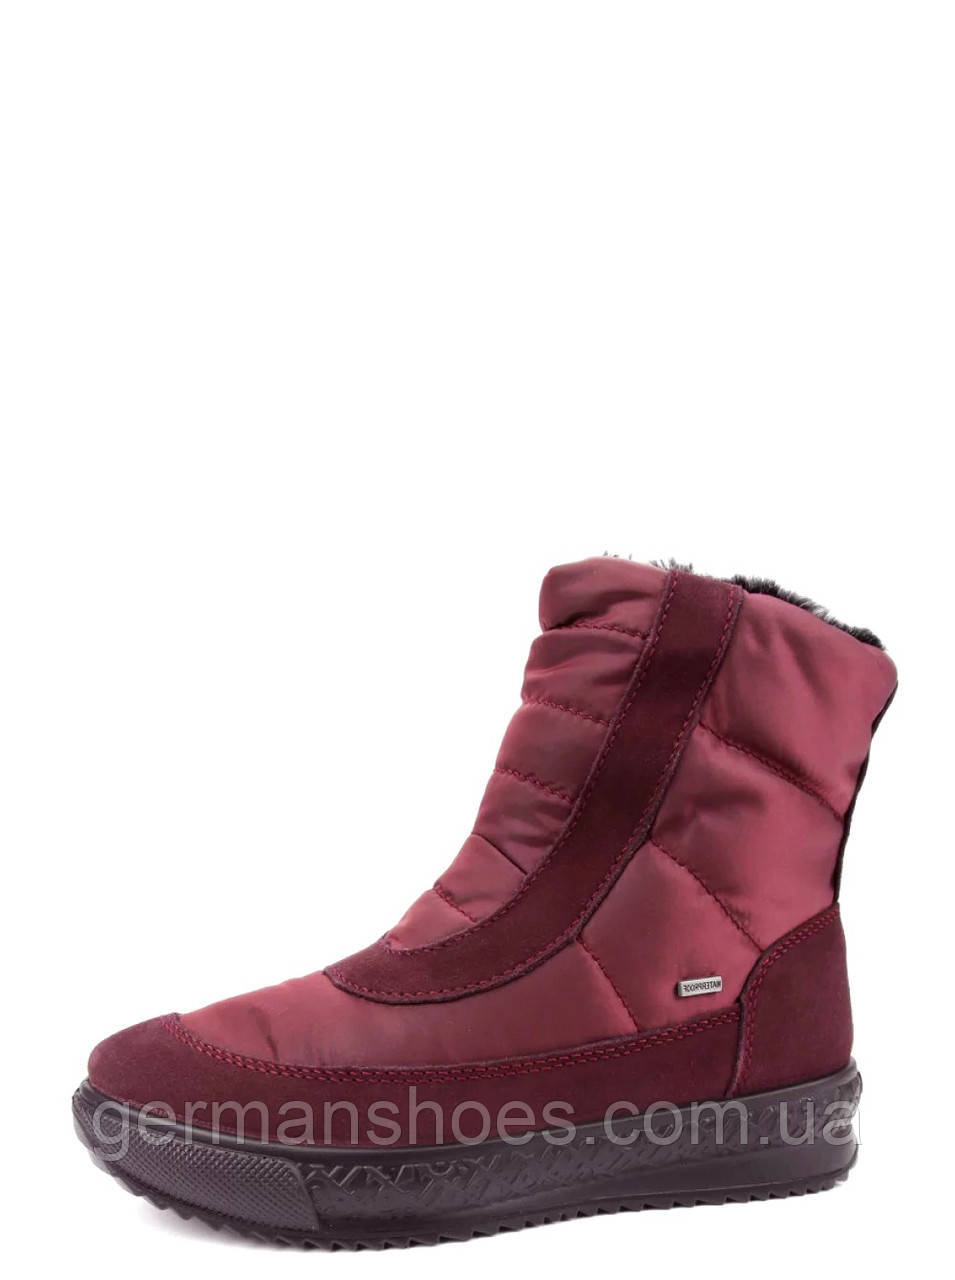 Ботинки женские Romika 8201R200